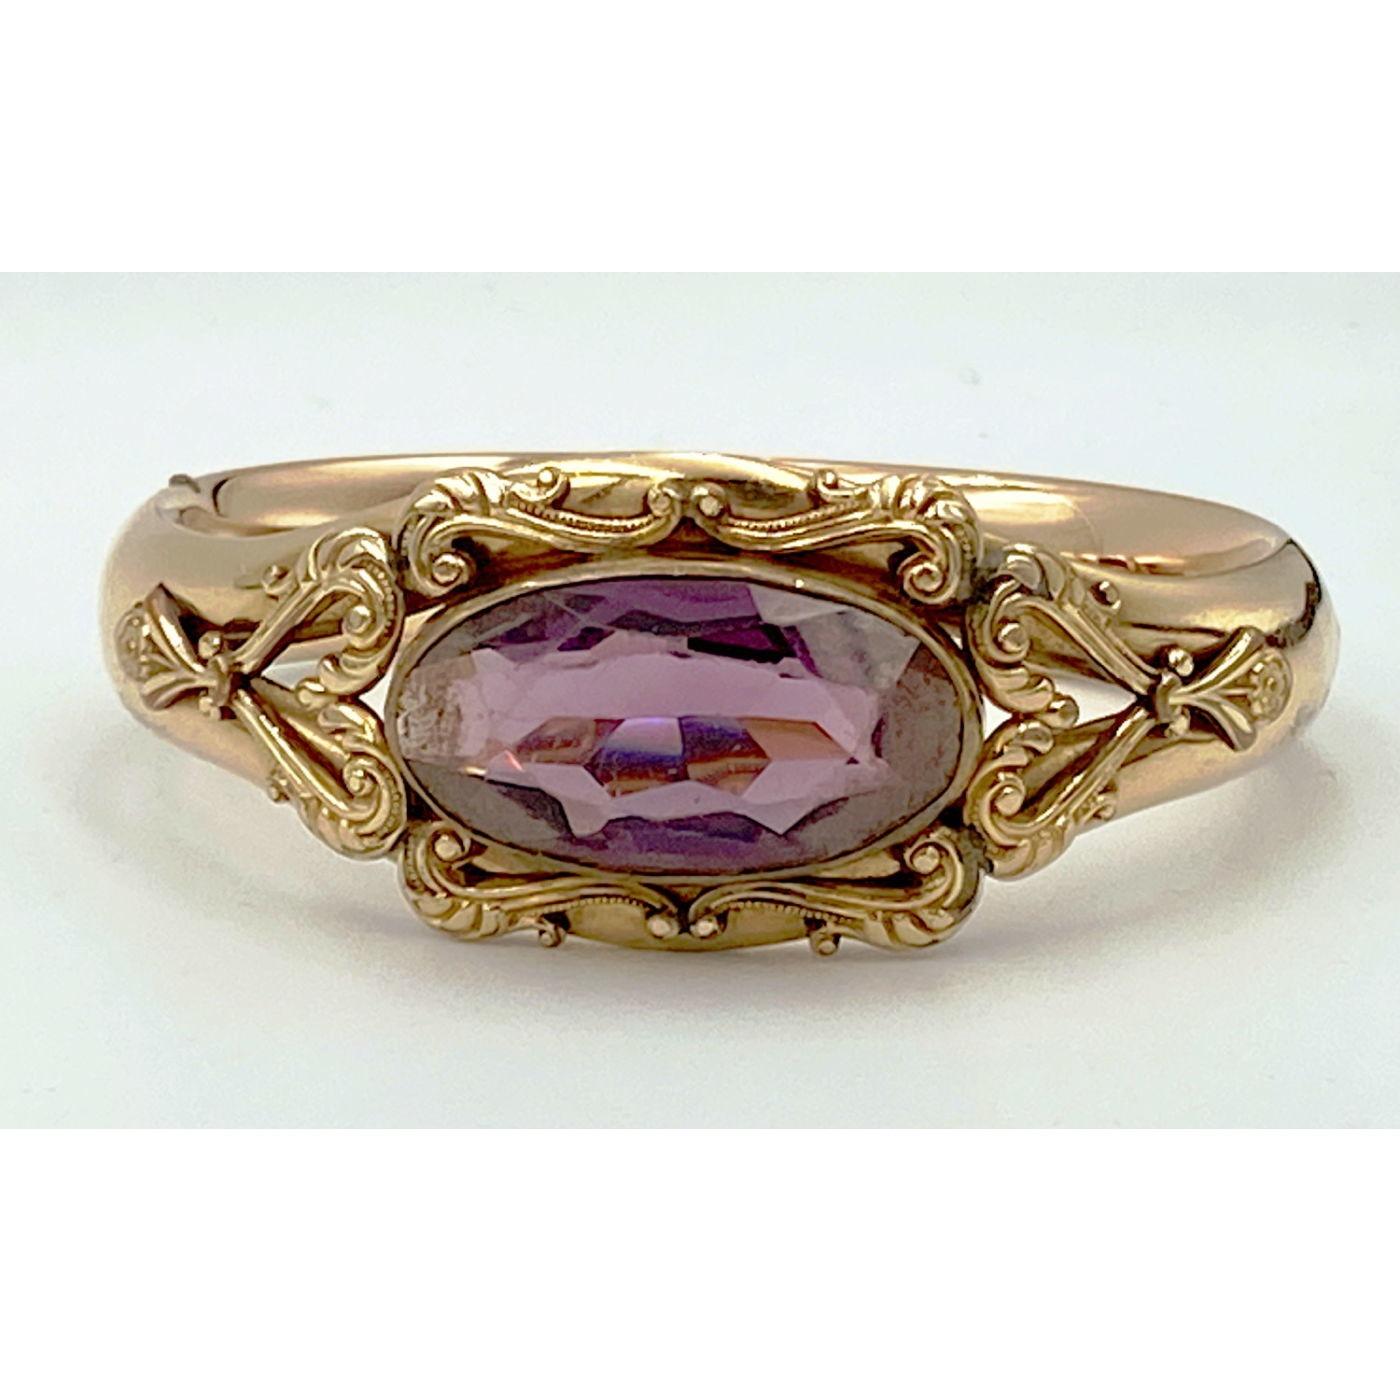 Prettiest Center Purple Stone Larger-Than-Average Engagement Bangle